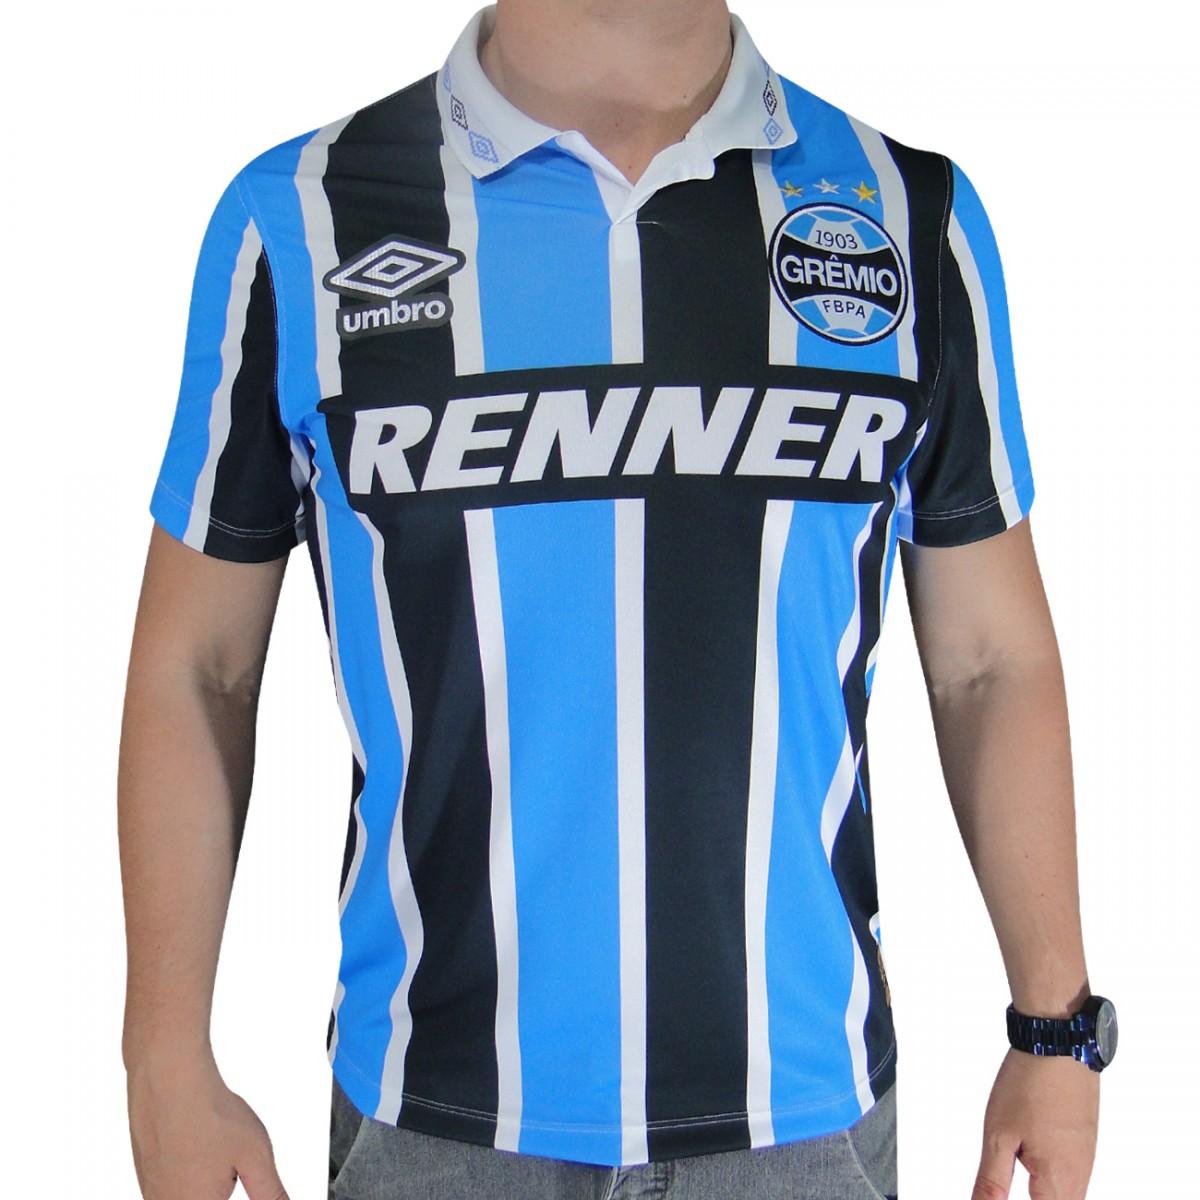 Camisa Gremio Umbro Bi Libertadores 1995 642387 - Tricolor - Chuteira Nike 1e53861c04648